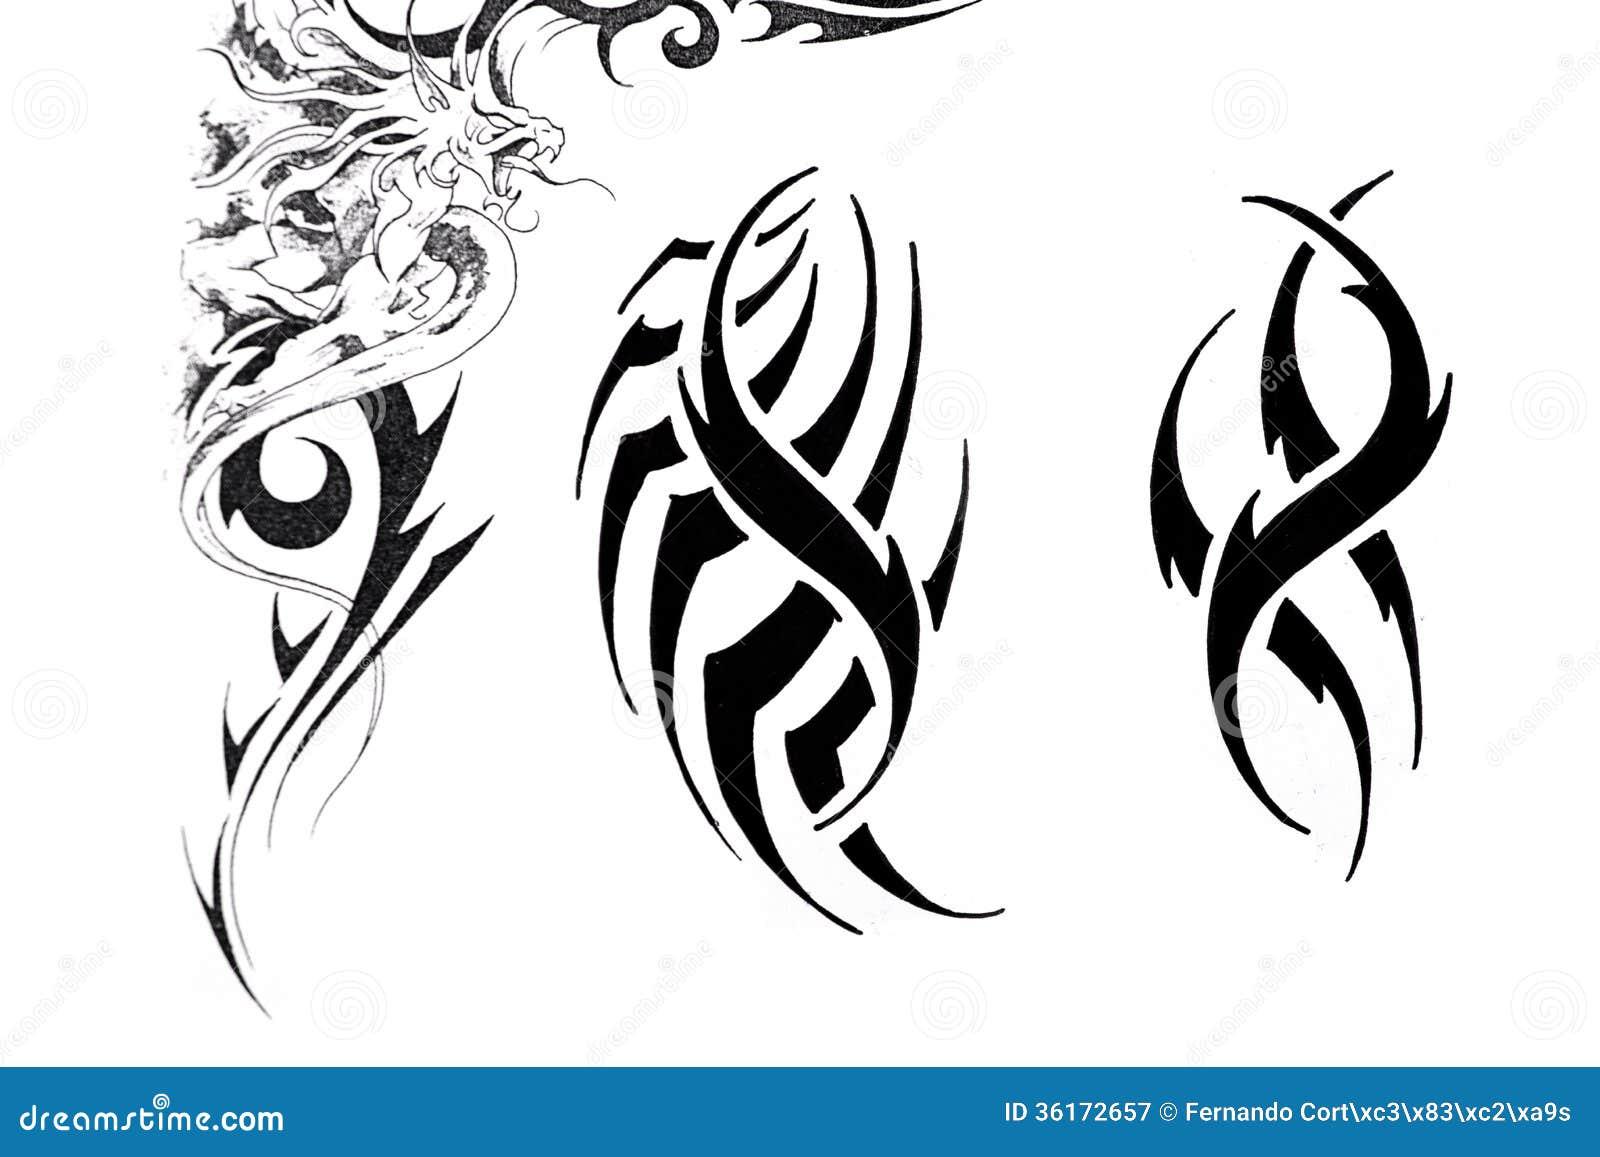 Sketch of tattoo art handmade artistic